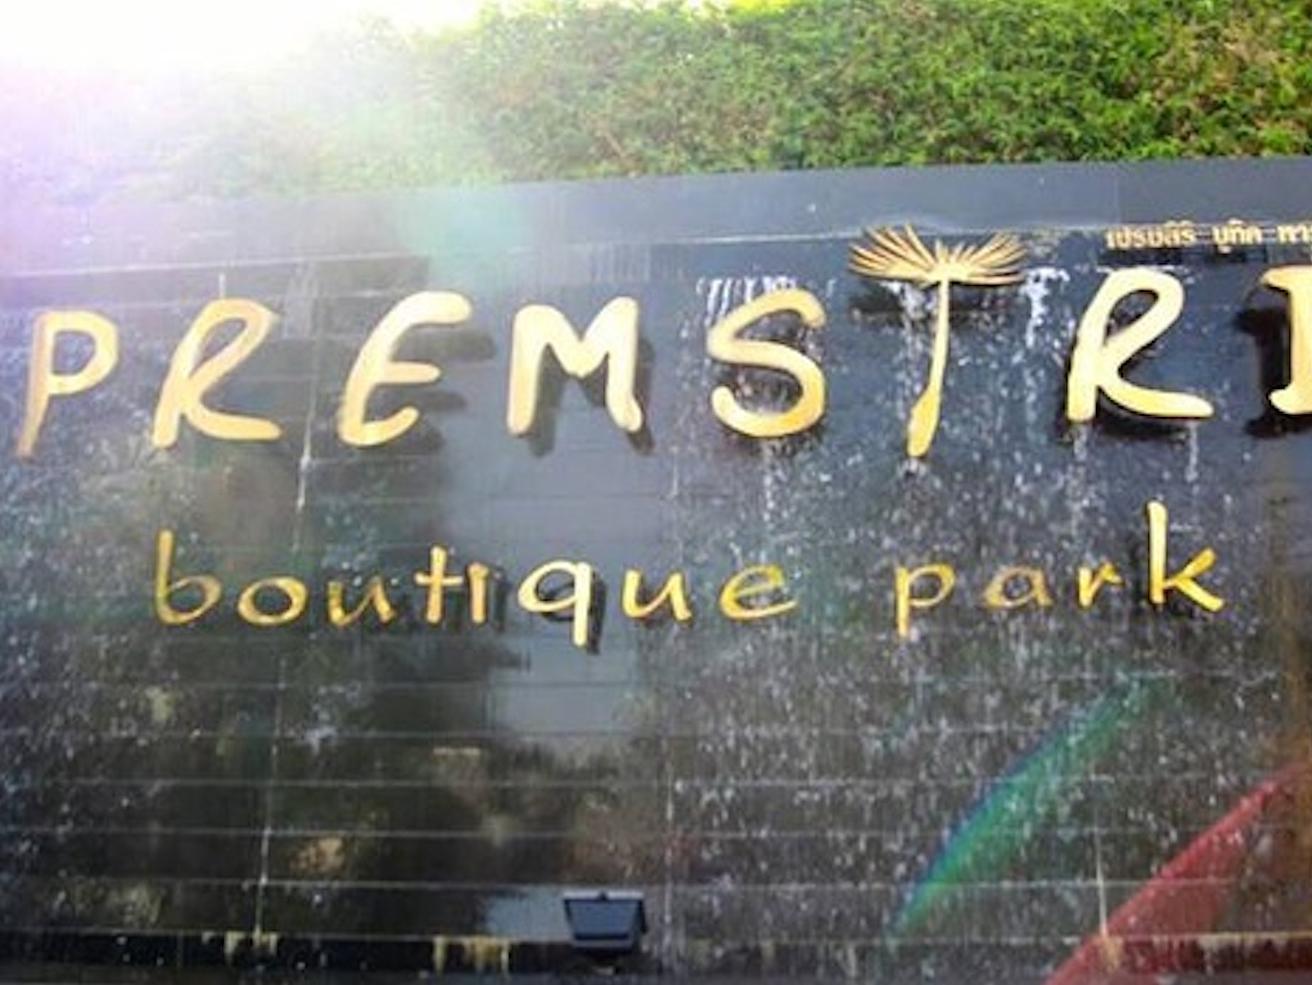 Premsiri Boutique Park